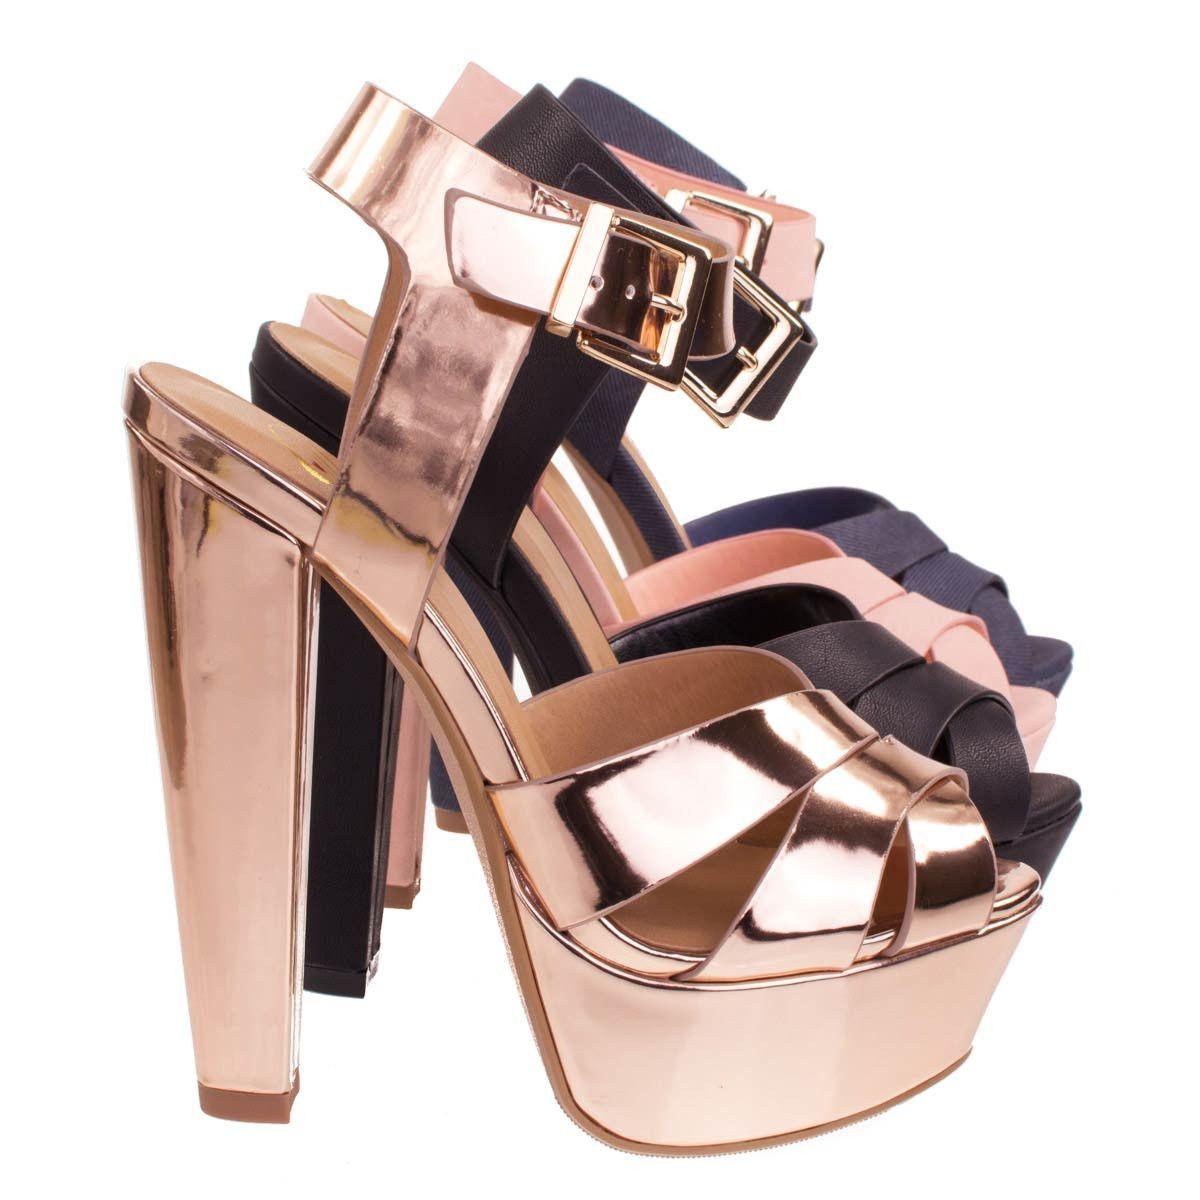 c69f4374597 Sedona Rose Gold by Delicious, Towering High Platform Block Heel ...